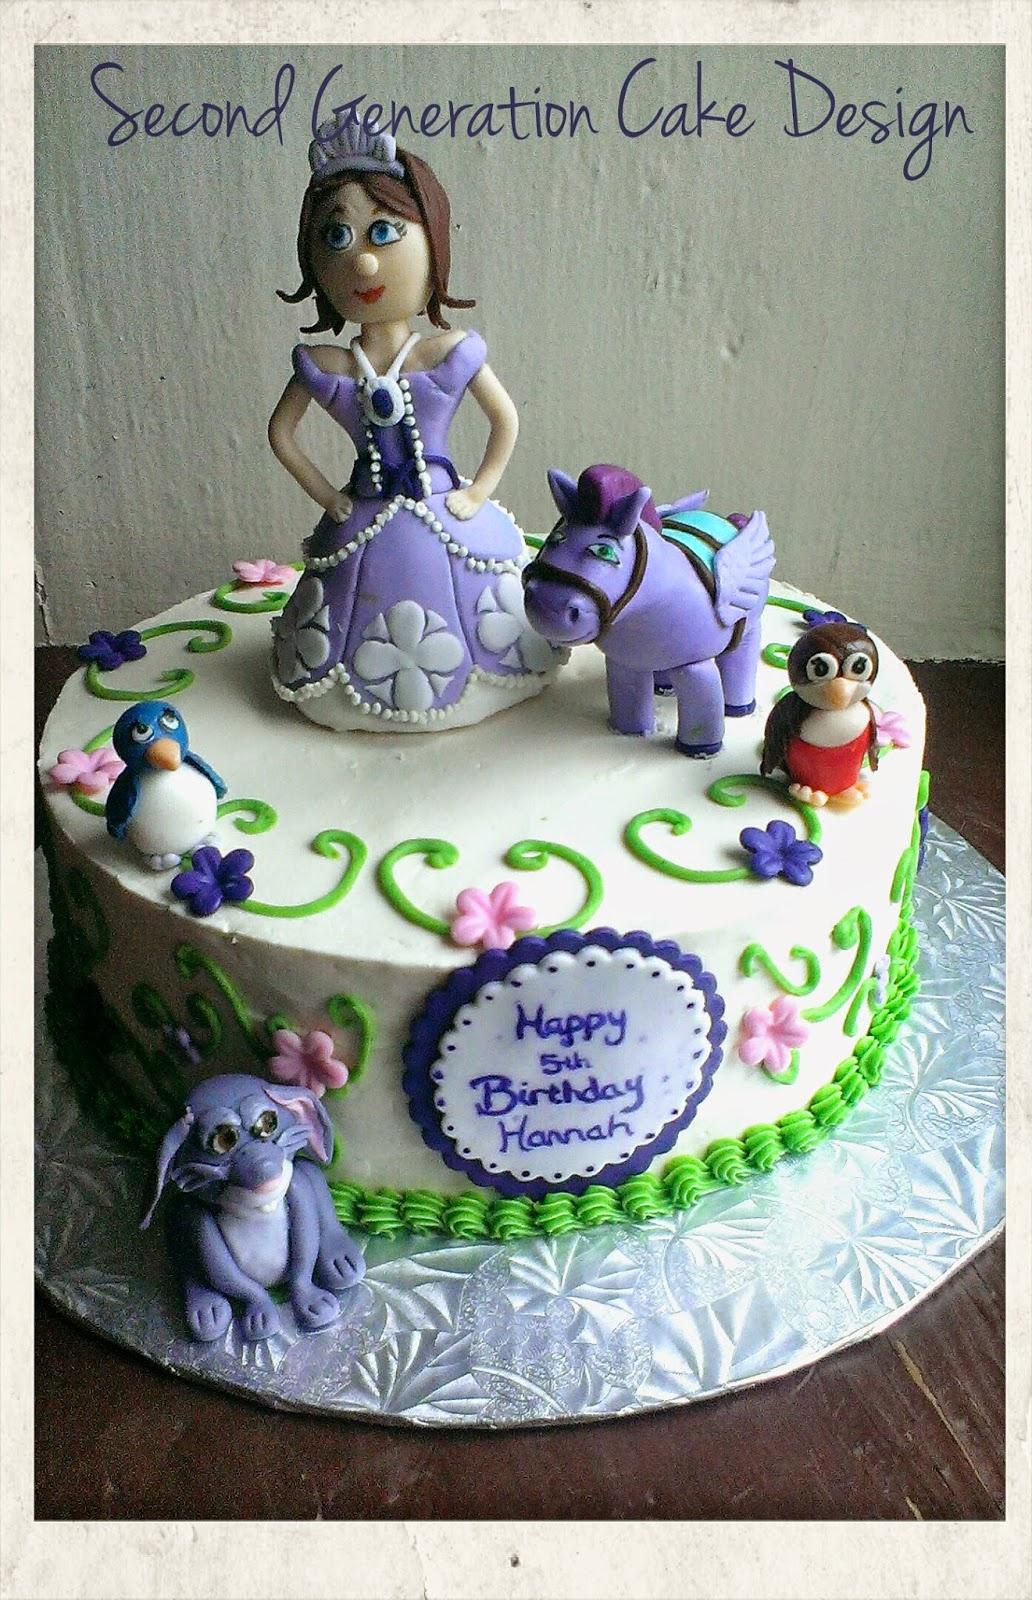 Second Generation Cake Design